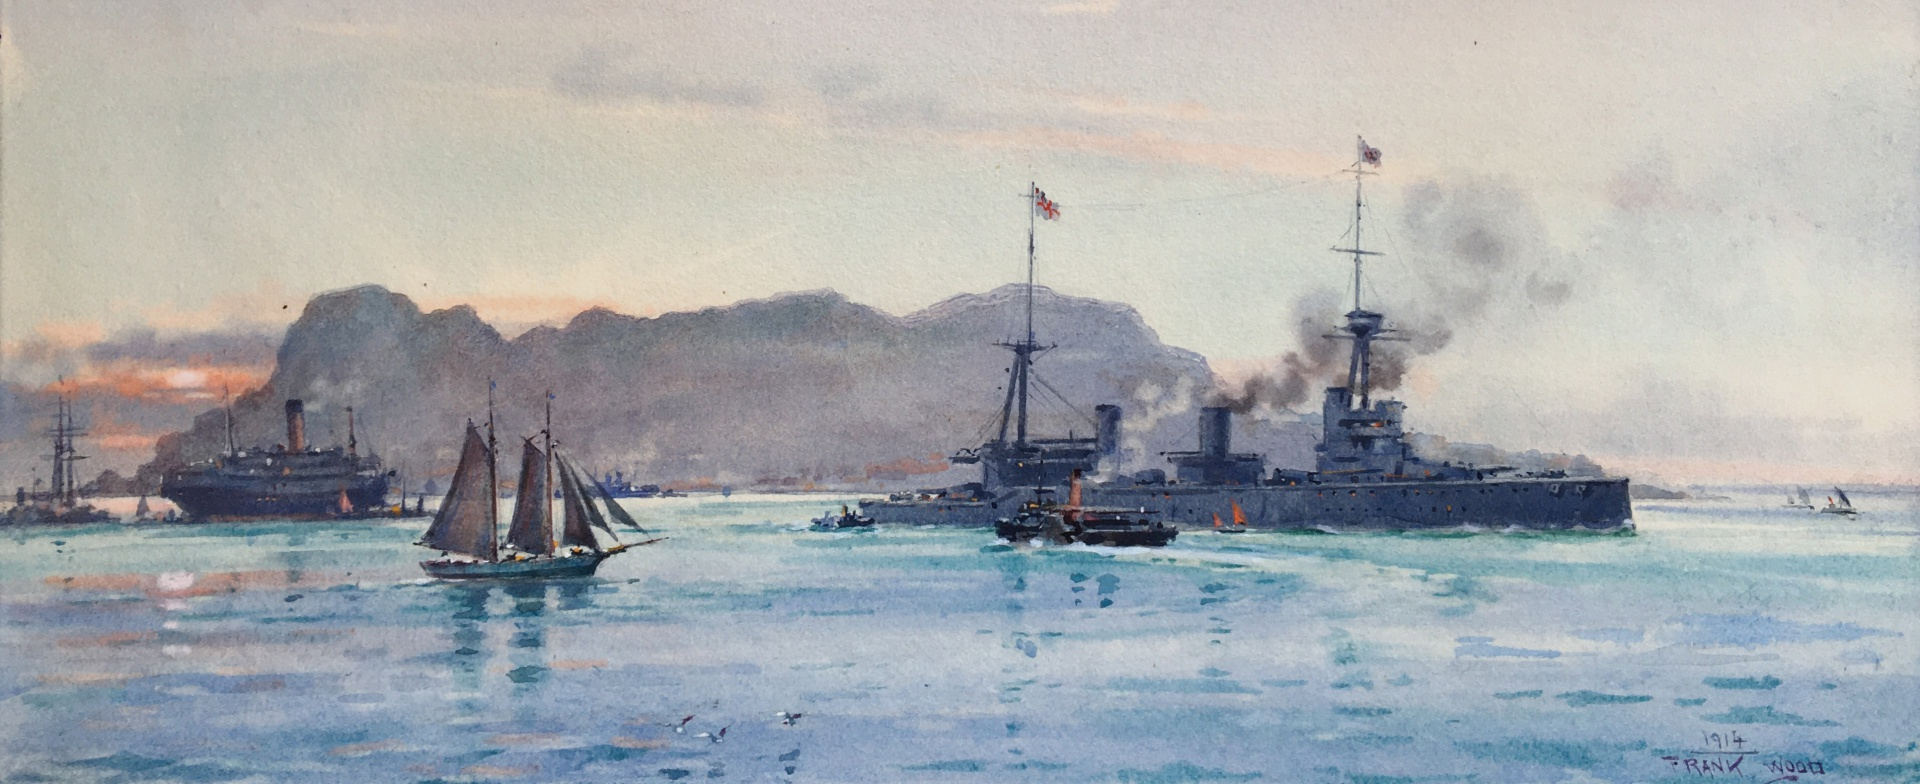 HMS NEW ZEALAND leaving GIbraltar